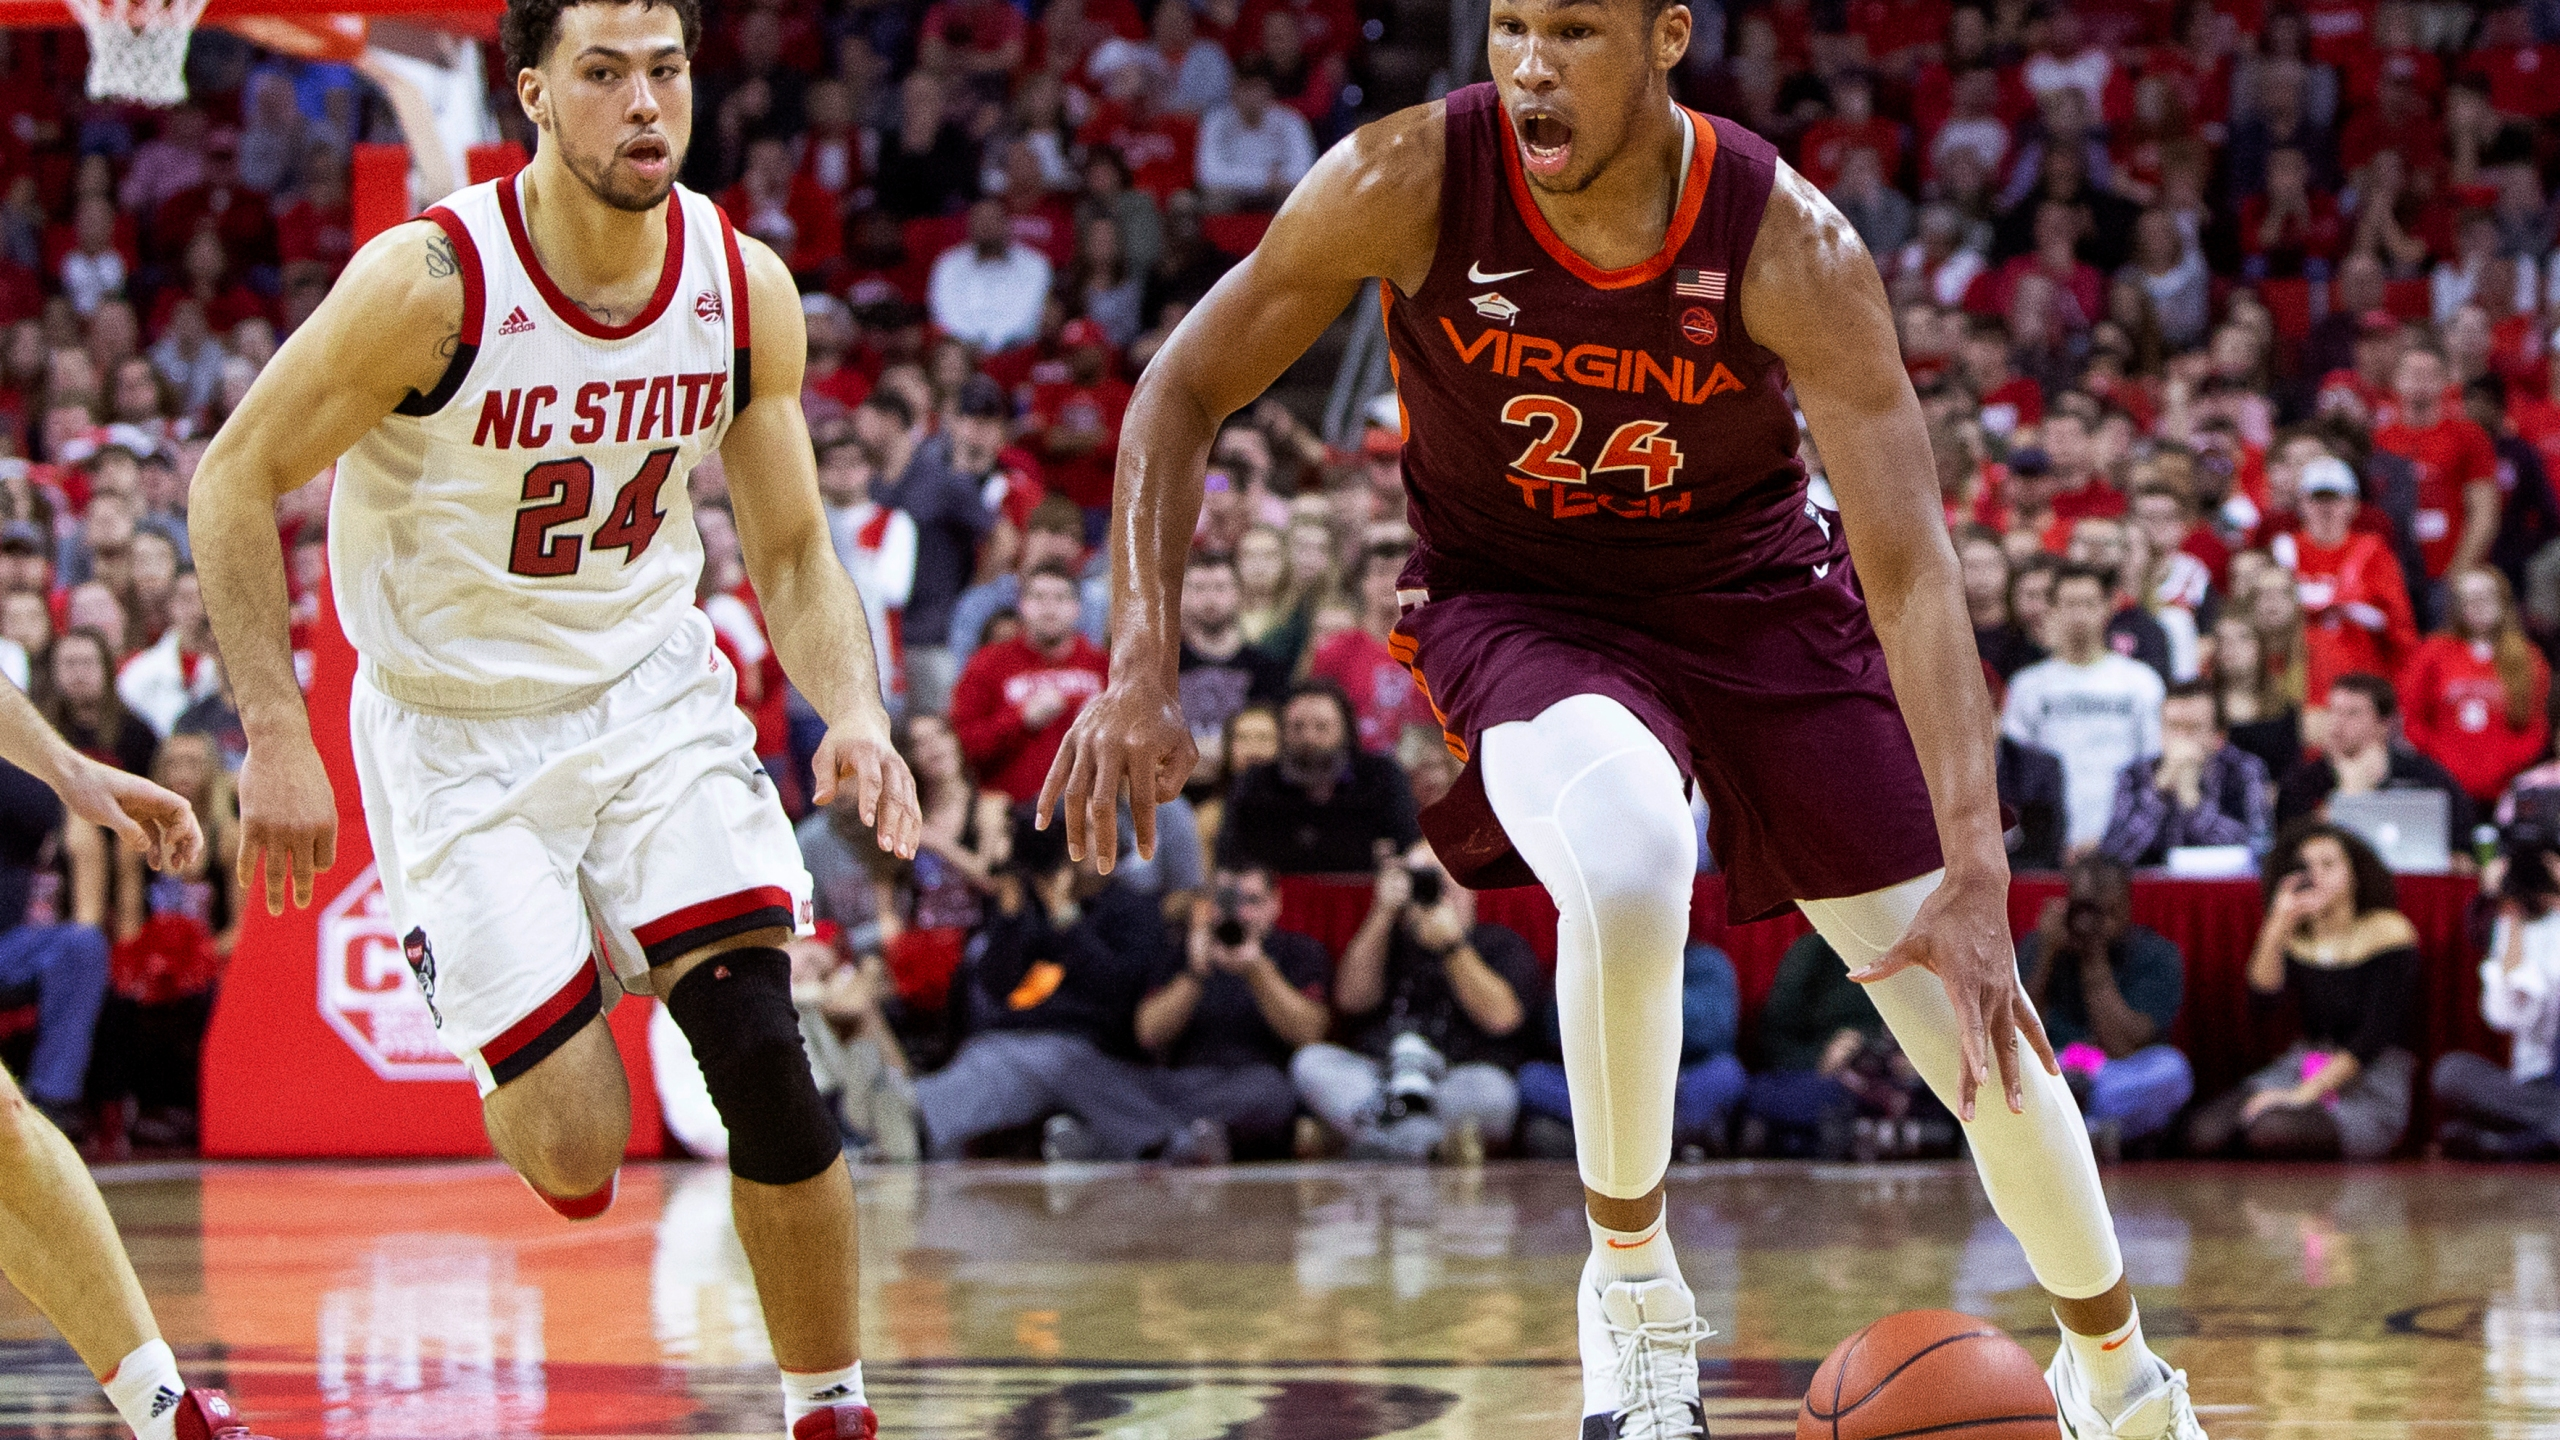 Virginia Tech North Carolina State Basketball_1549146596004